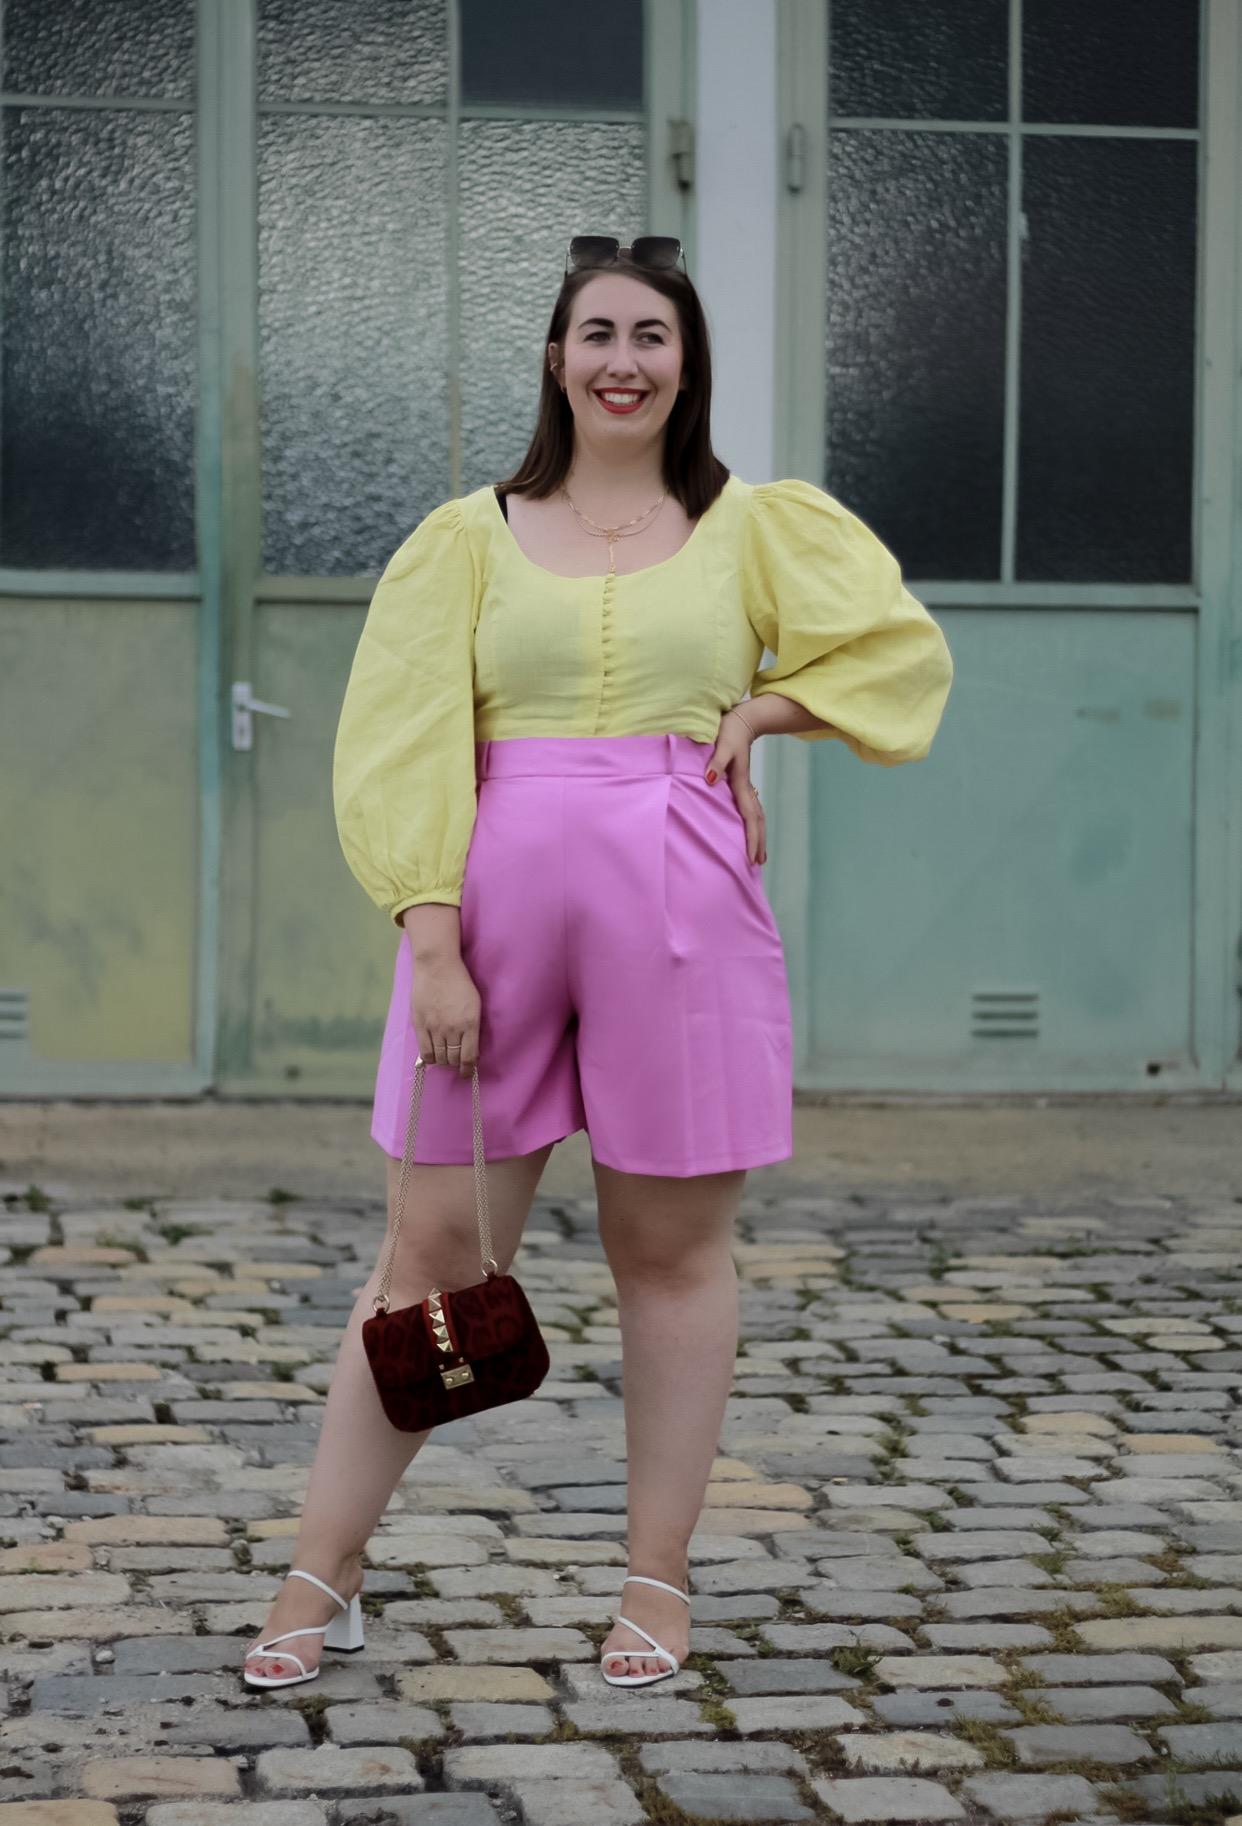 Candy-Colours-Pink-Peacock-Zitronengelb-Miss-Suzie-Loves-Susanne-Heidebach